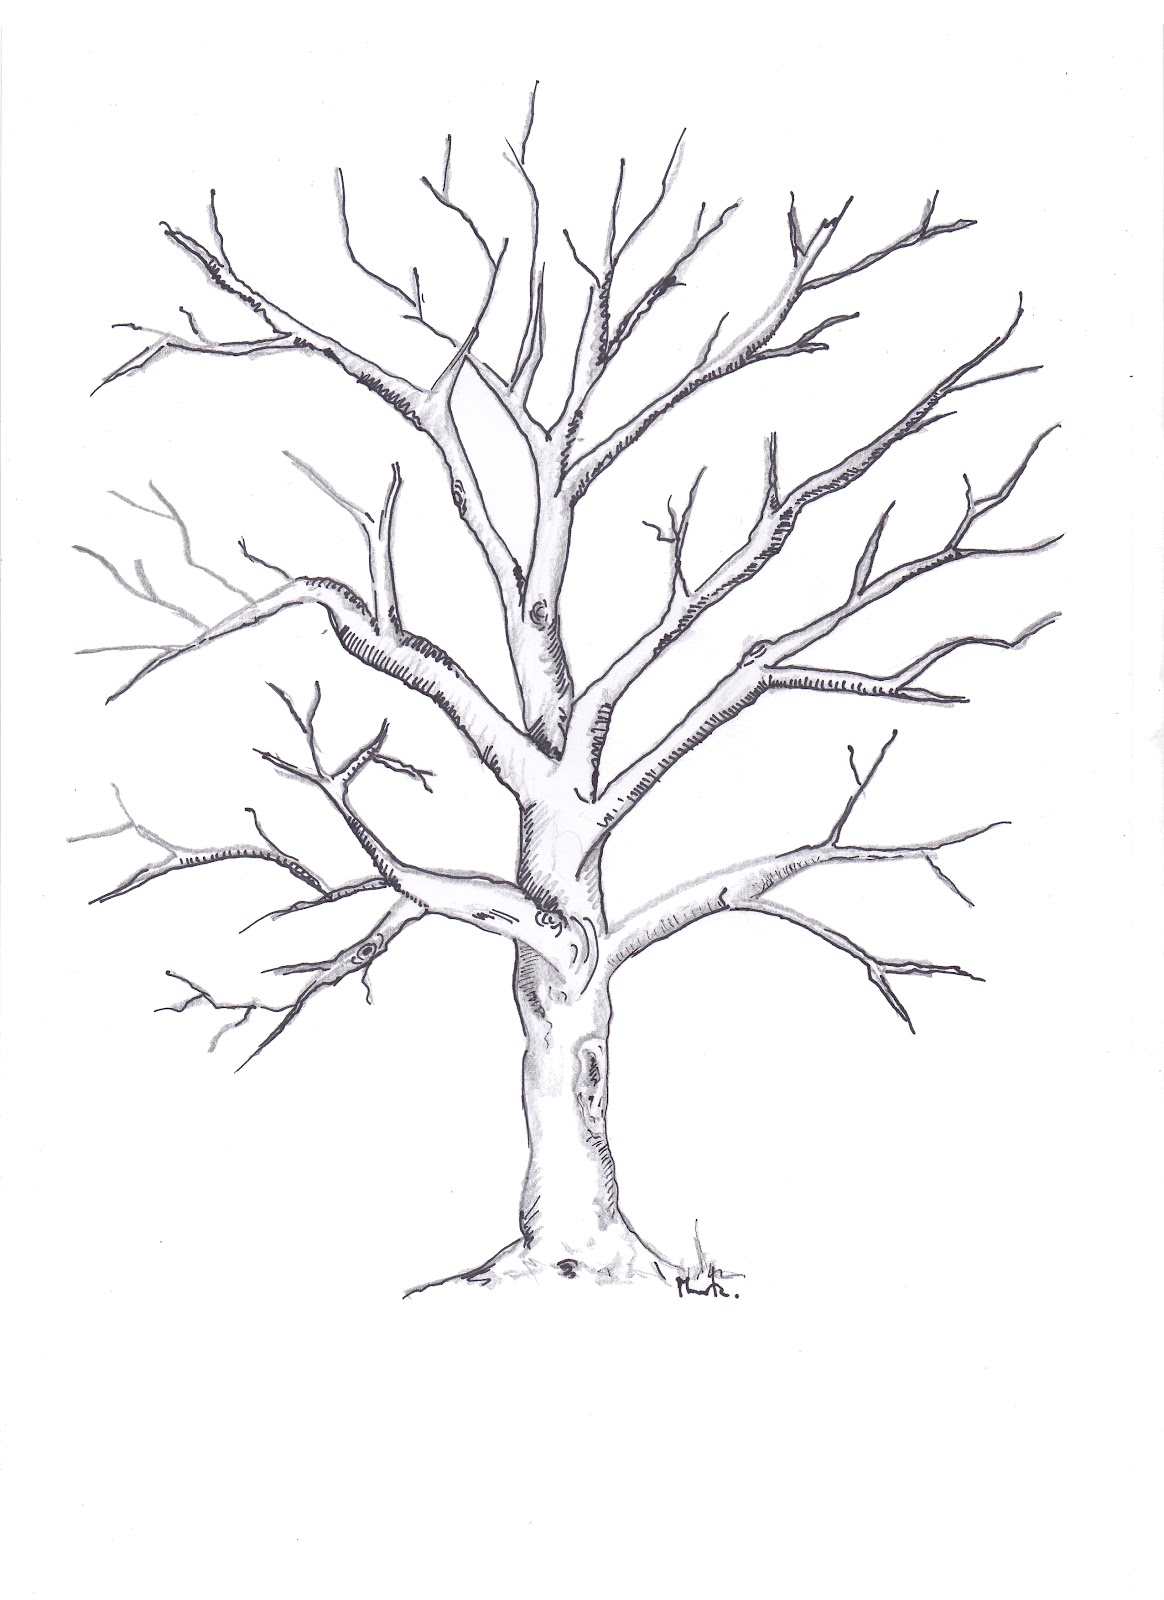 Dibujos de arboles sin hojas para imprimir  Imagui